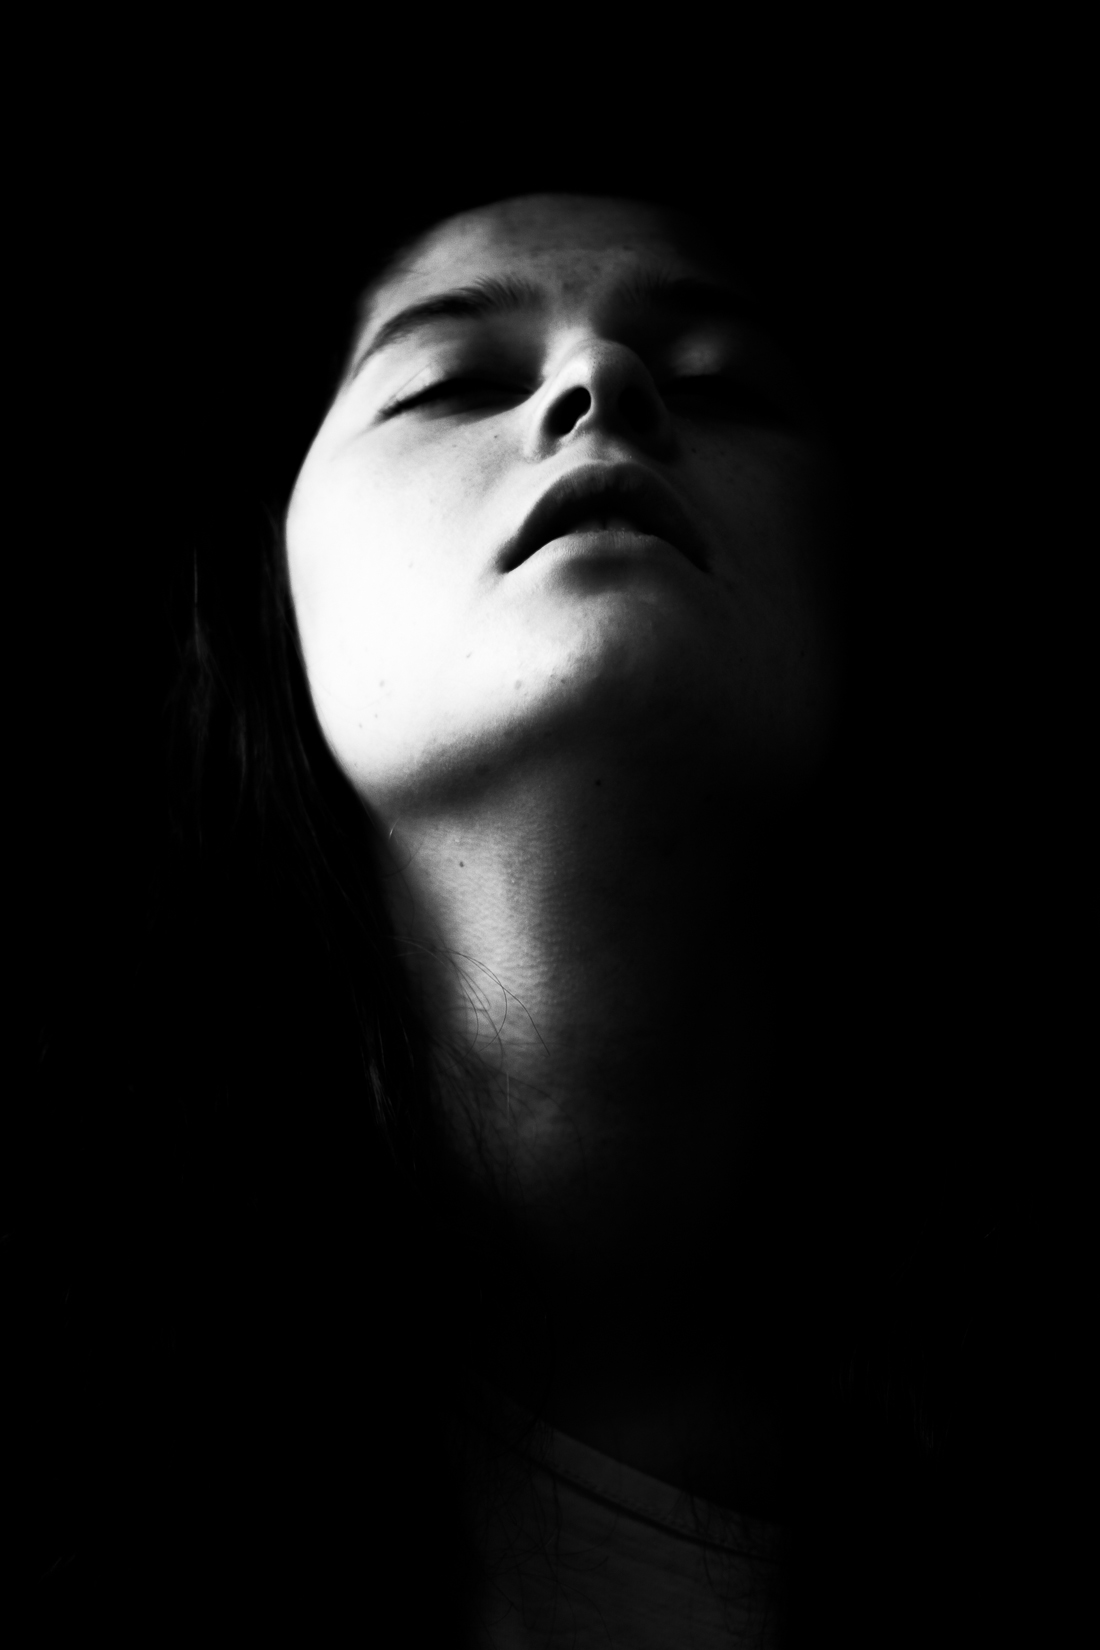 Laura Hospes mental health photos